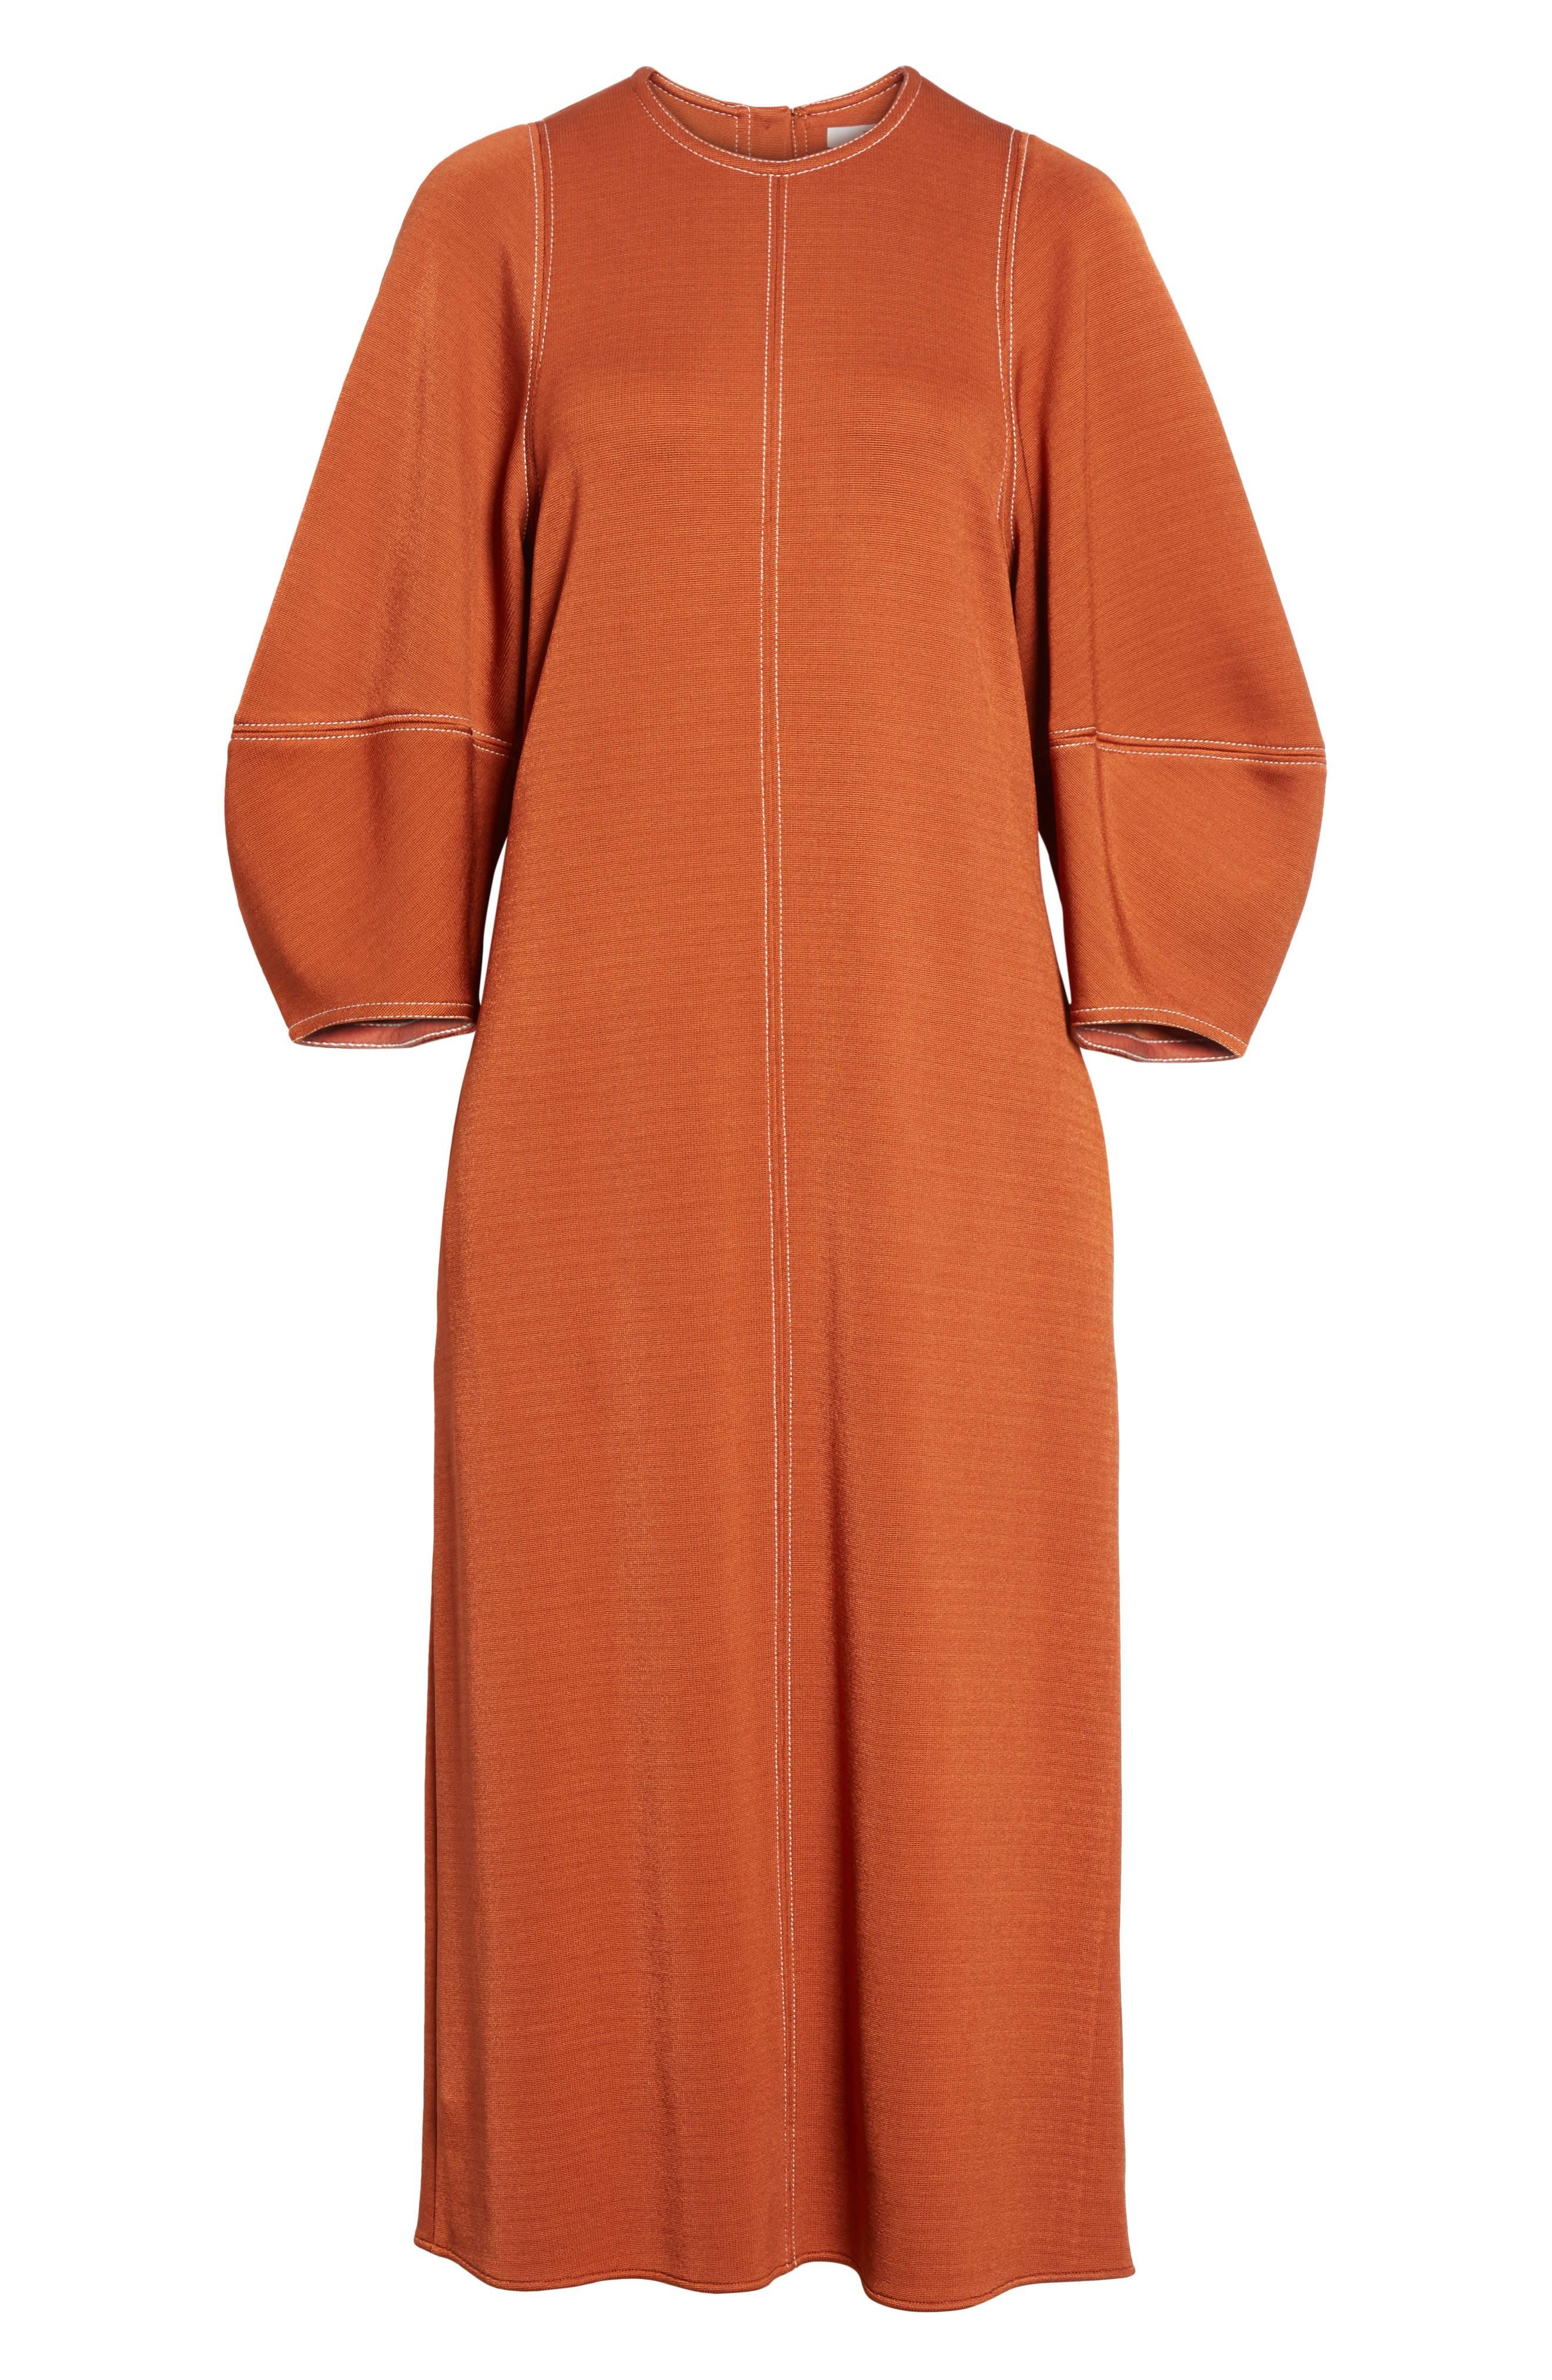 Balloon Sleeve Crepe Knit Midi Dress,                             Alternate thumbnail 6, color,                             620